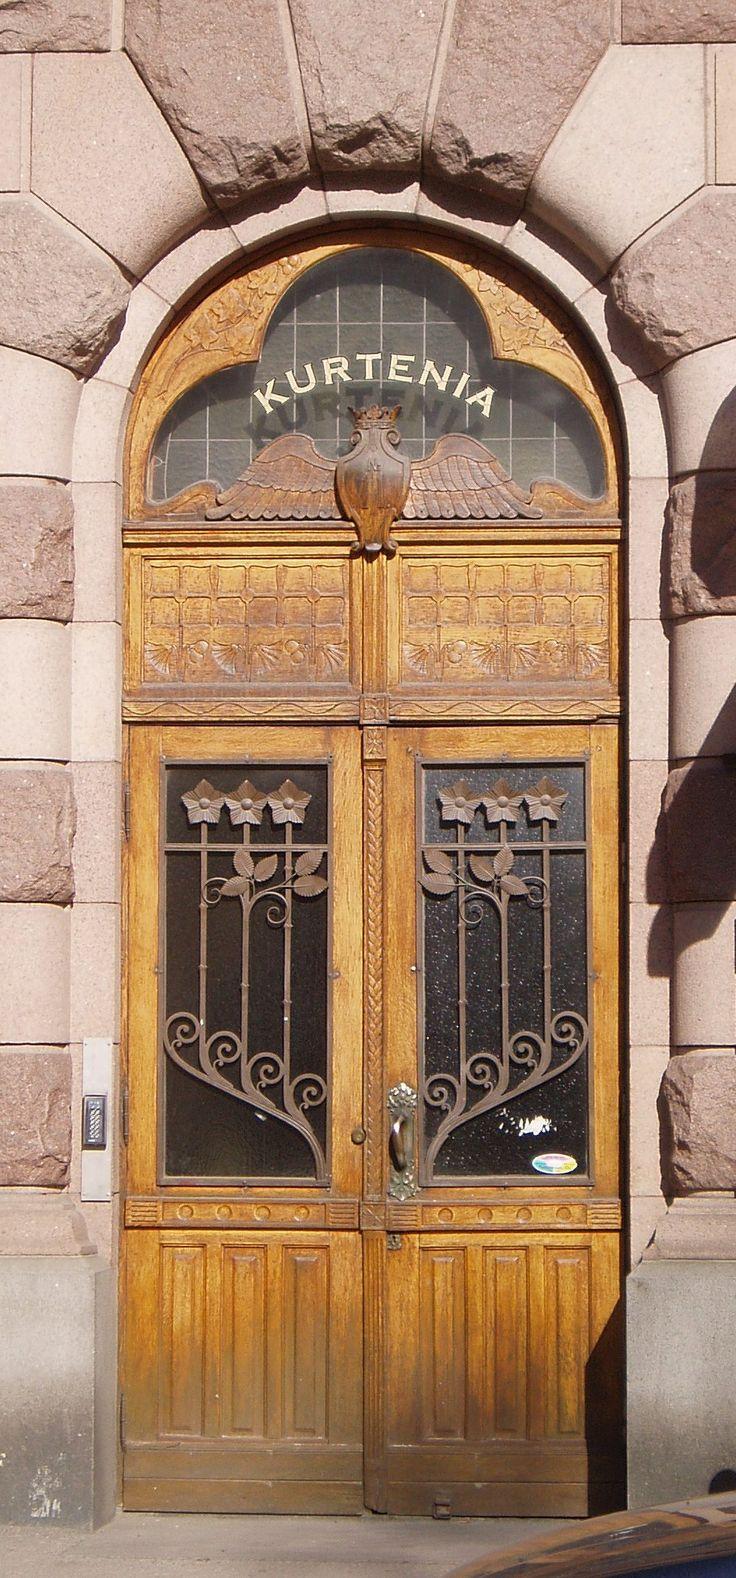 Door, Kurtenia house in Vaasa, Finland